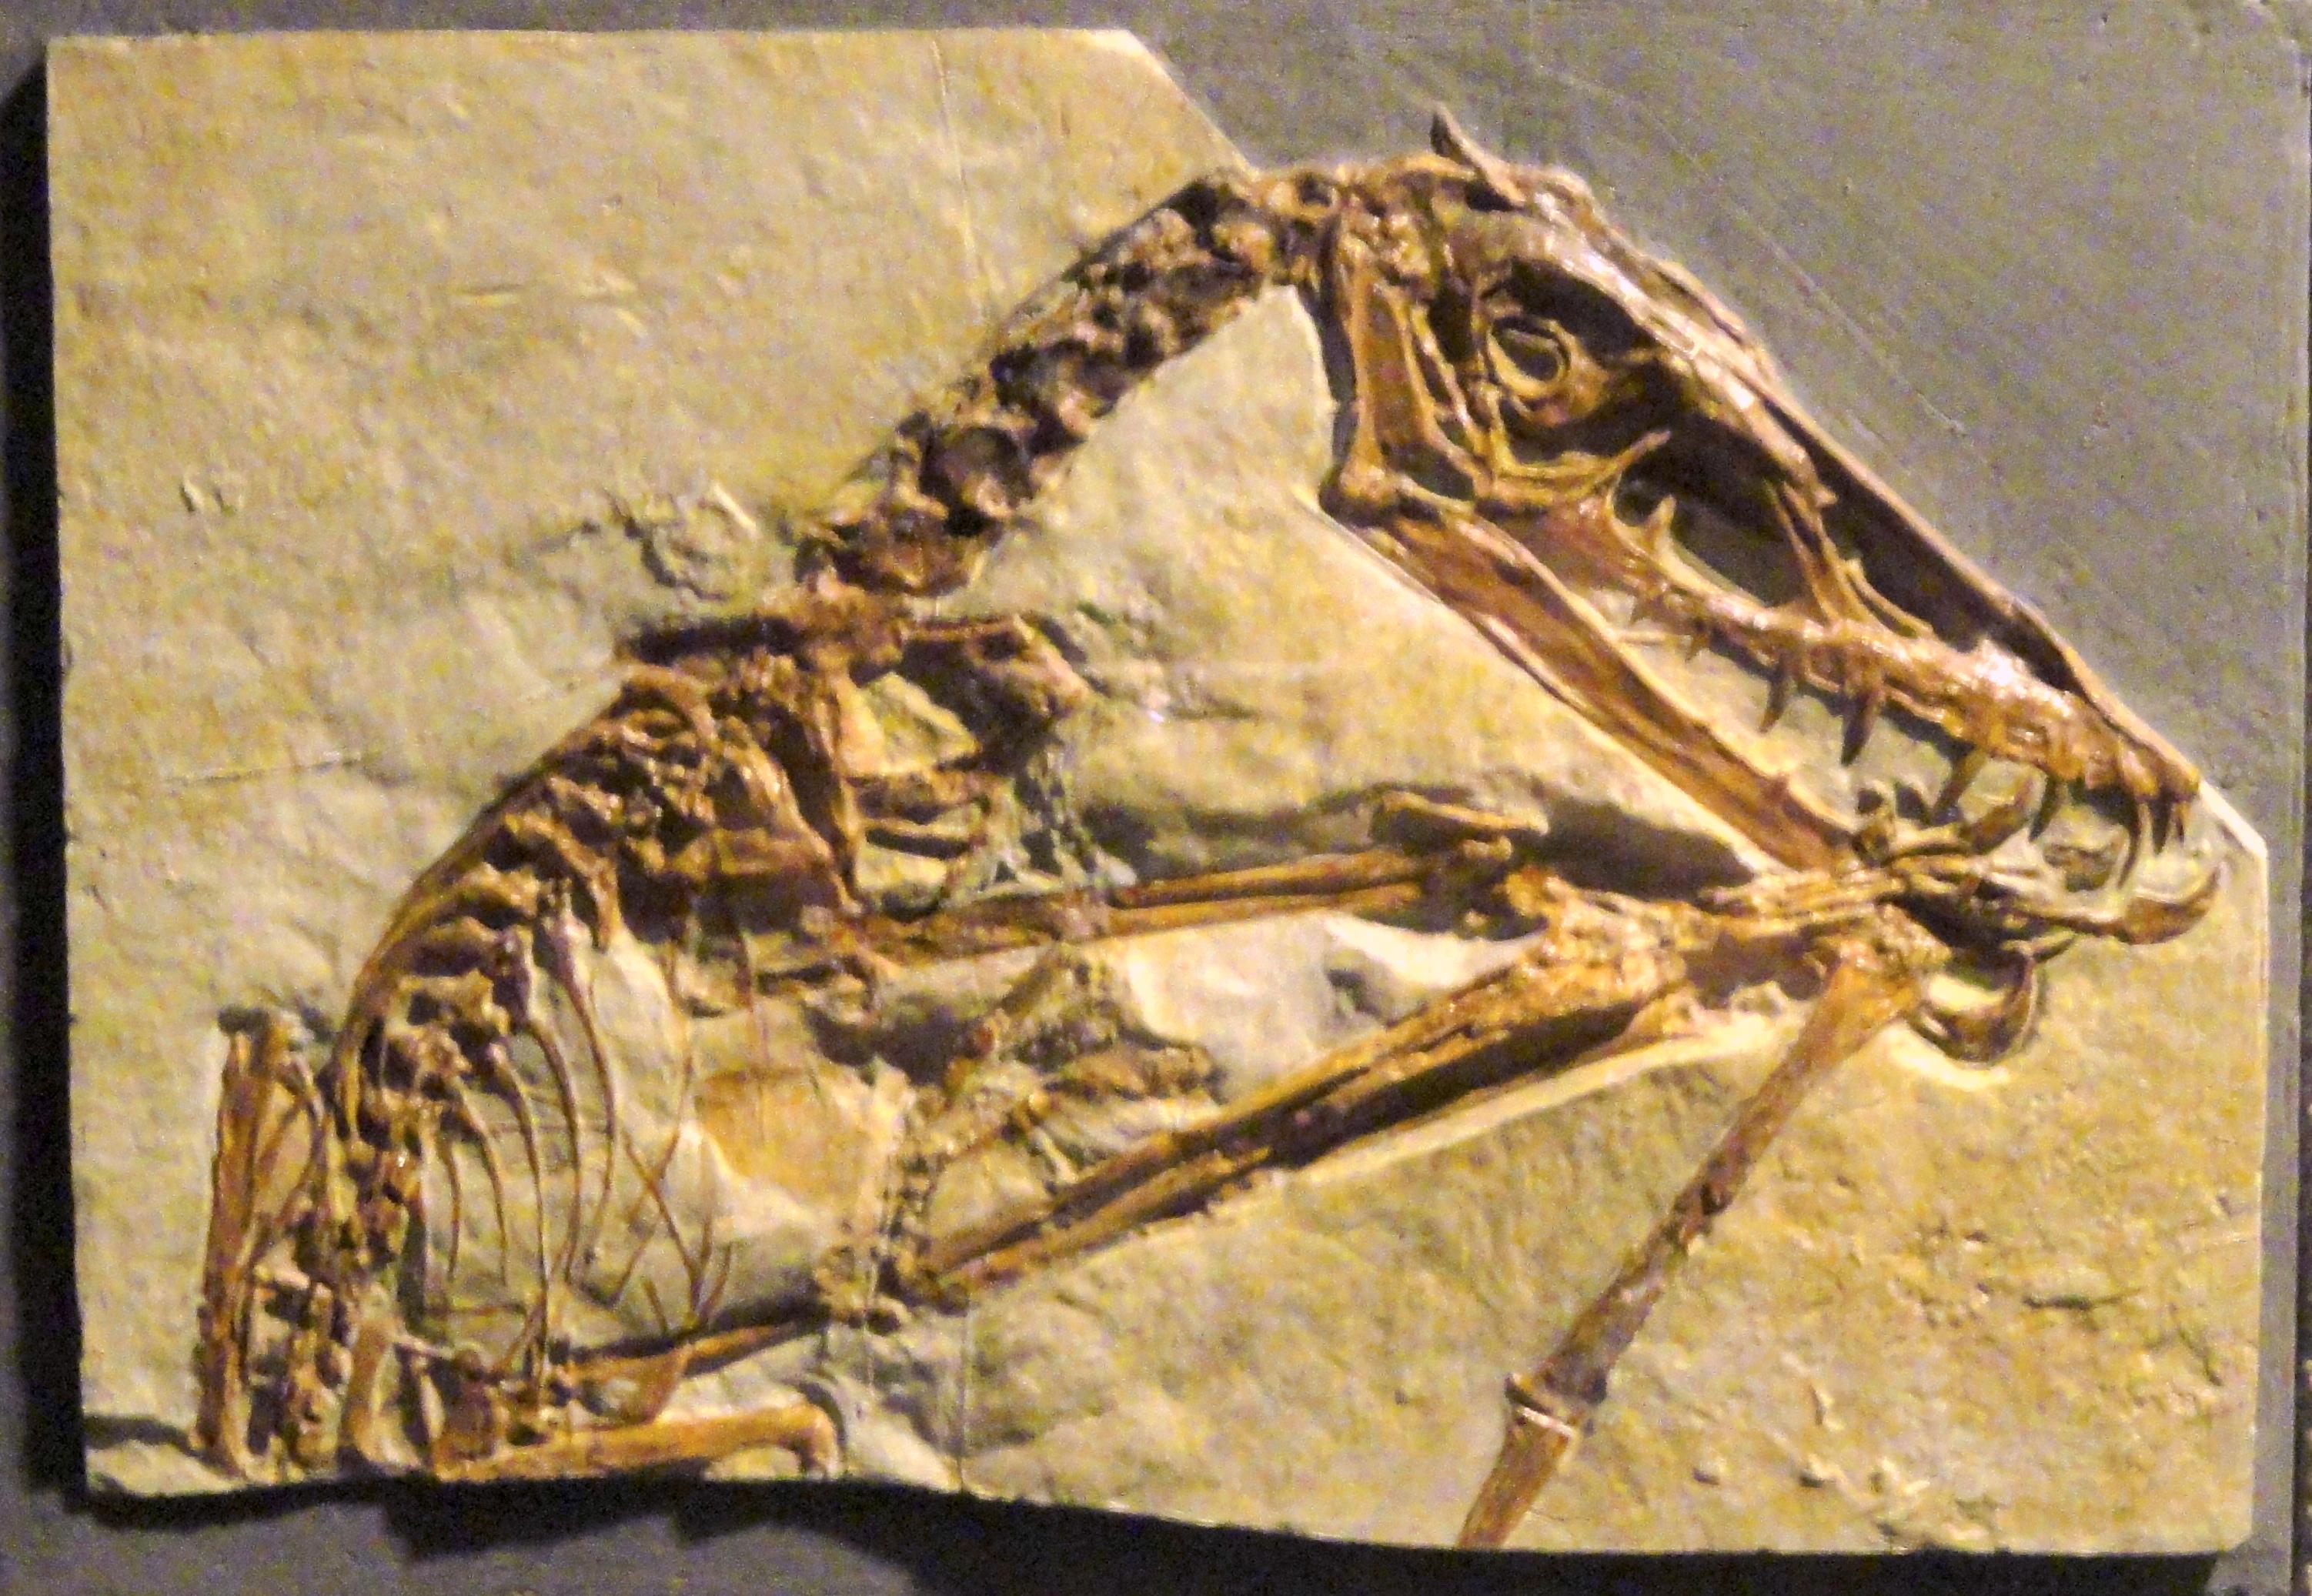 Pterorhynchus, no crest